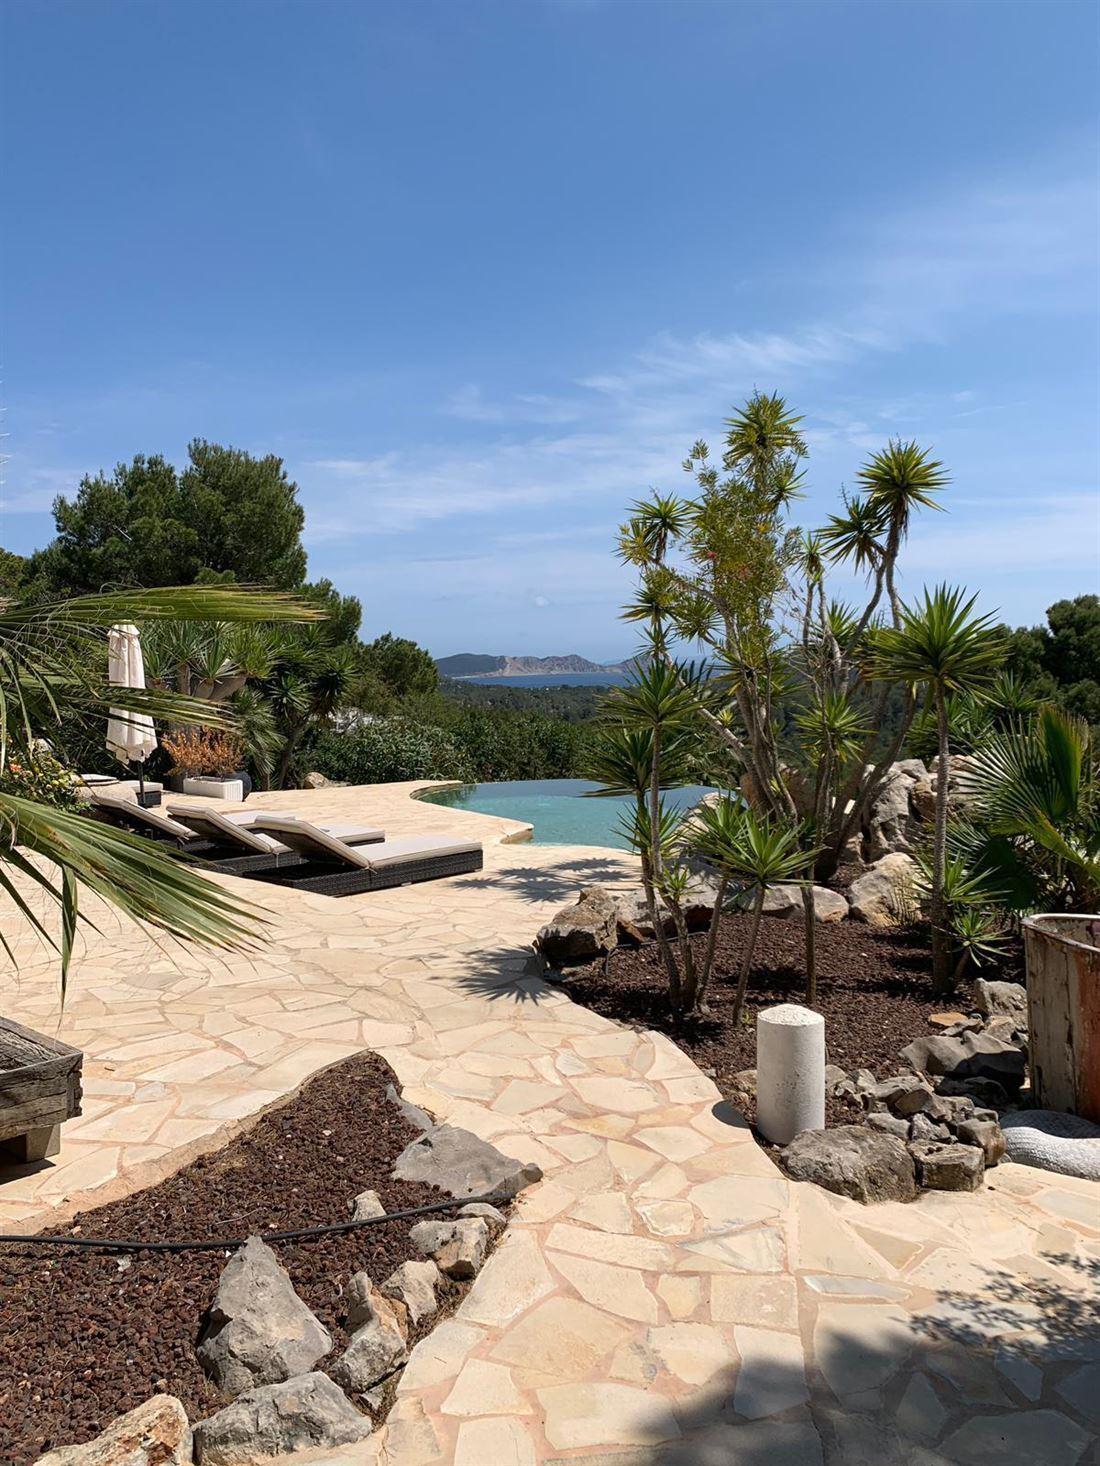 Charming villa located in the area Puig Redo close to Porroig